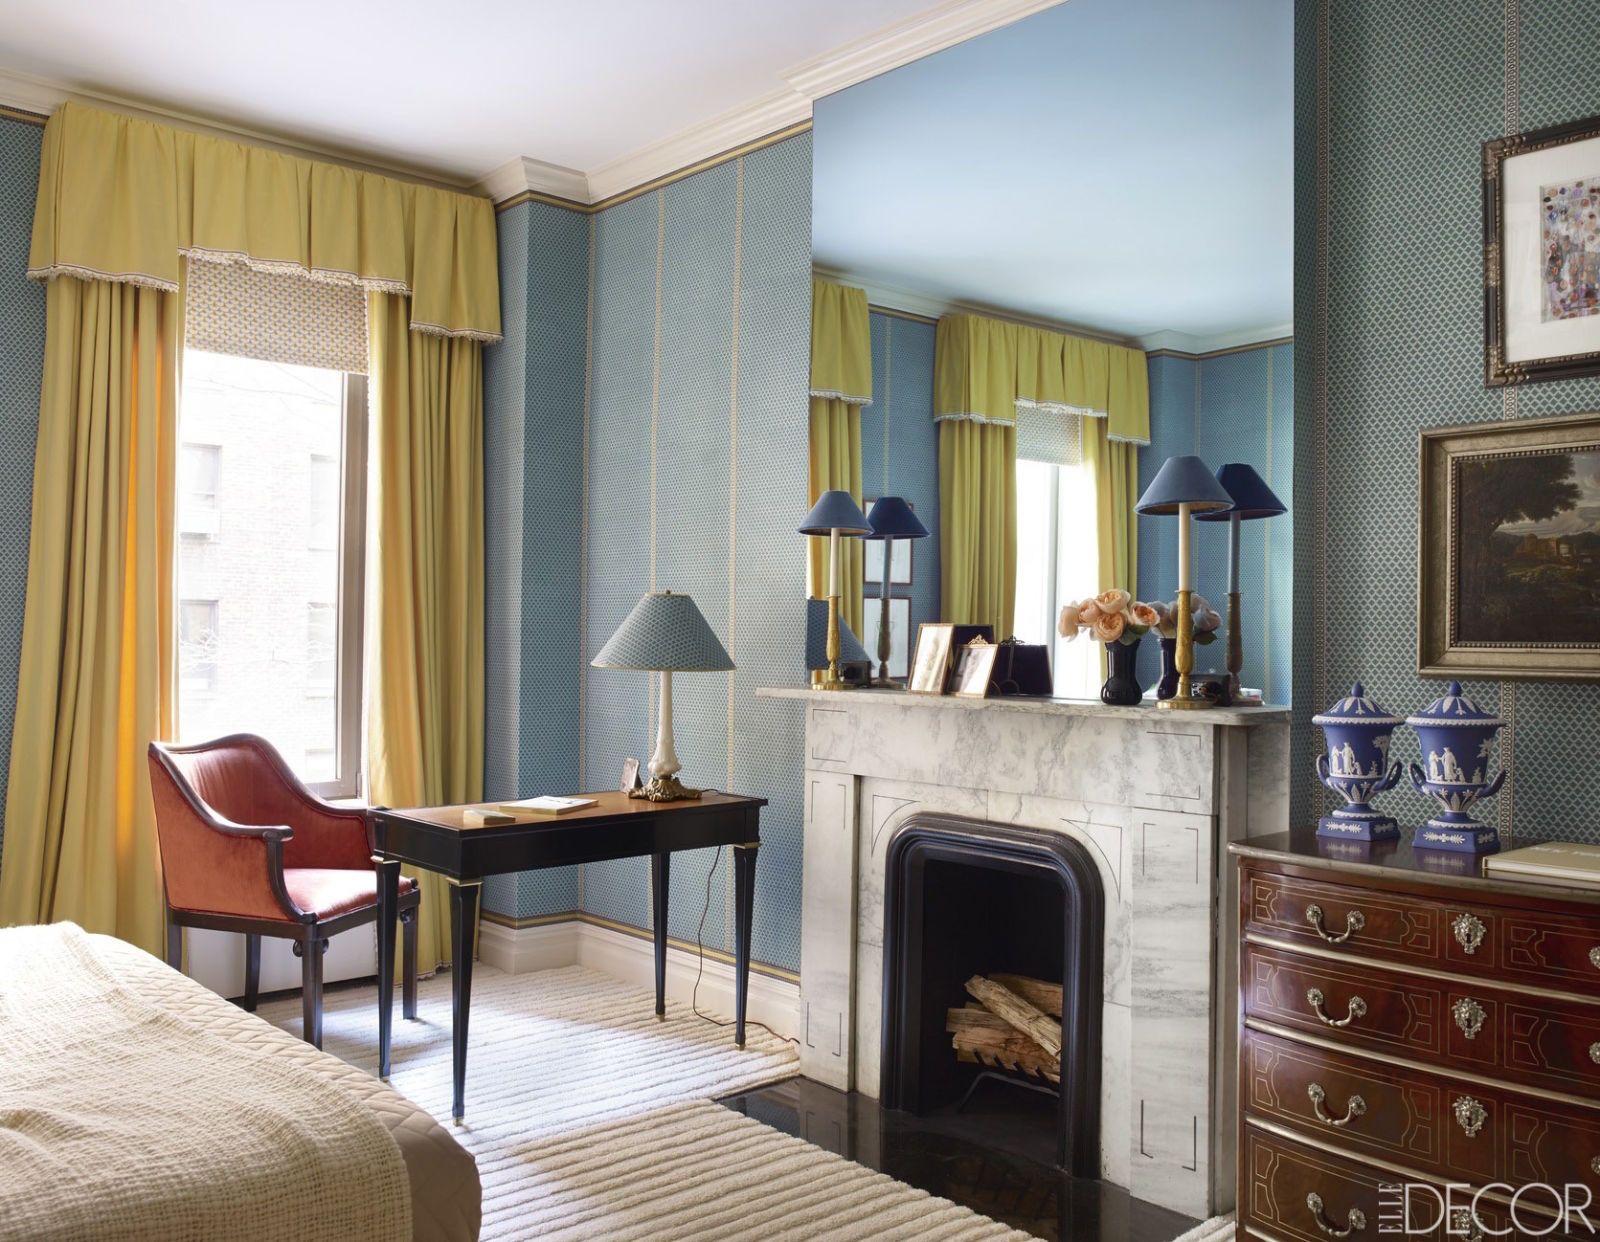 & Best Blue Bedrooms - Blue Room Ideas